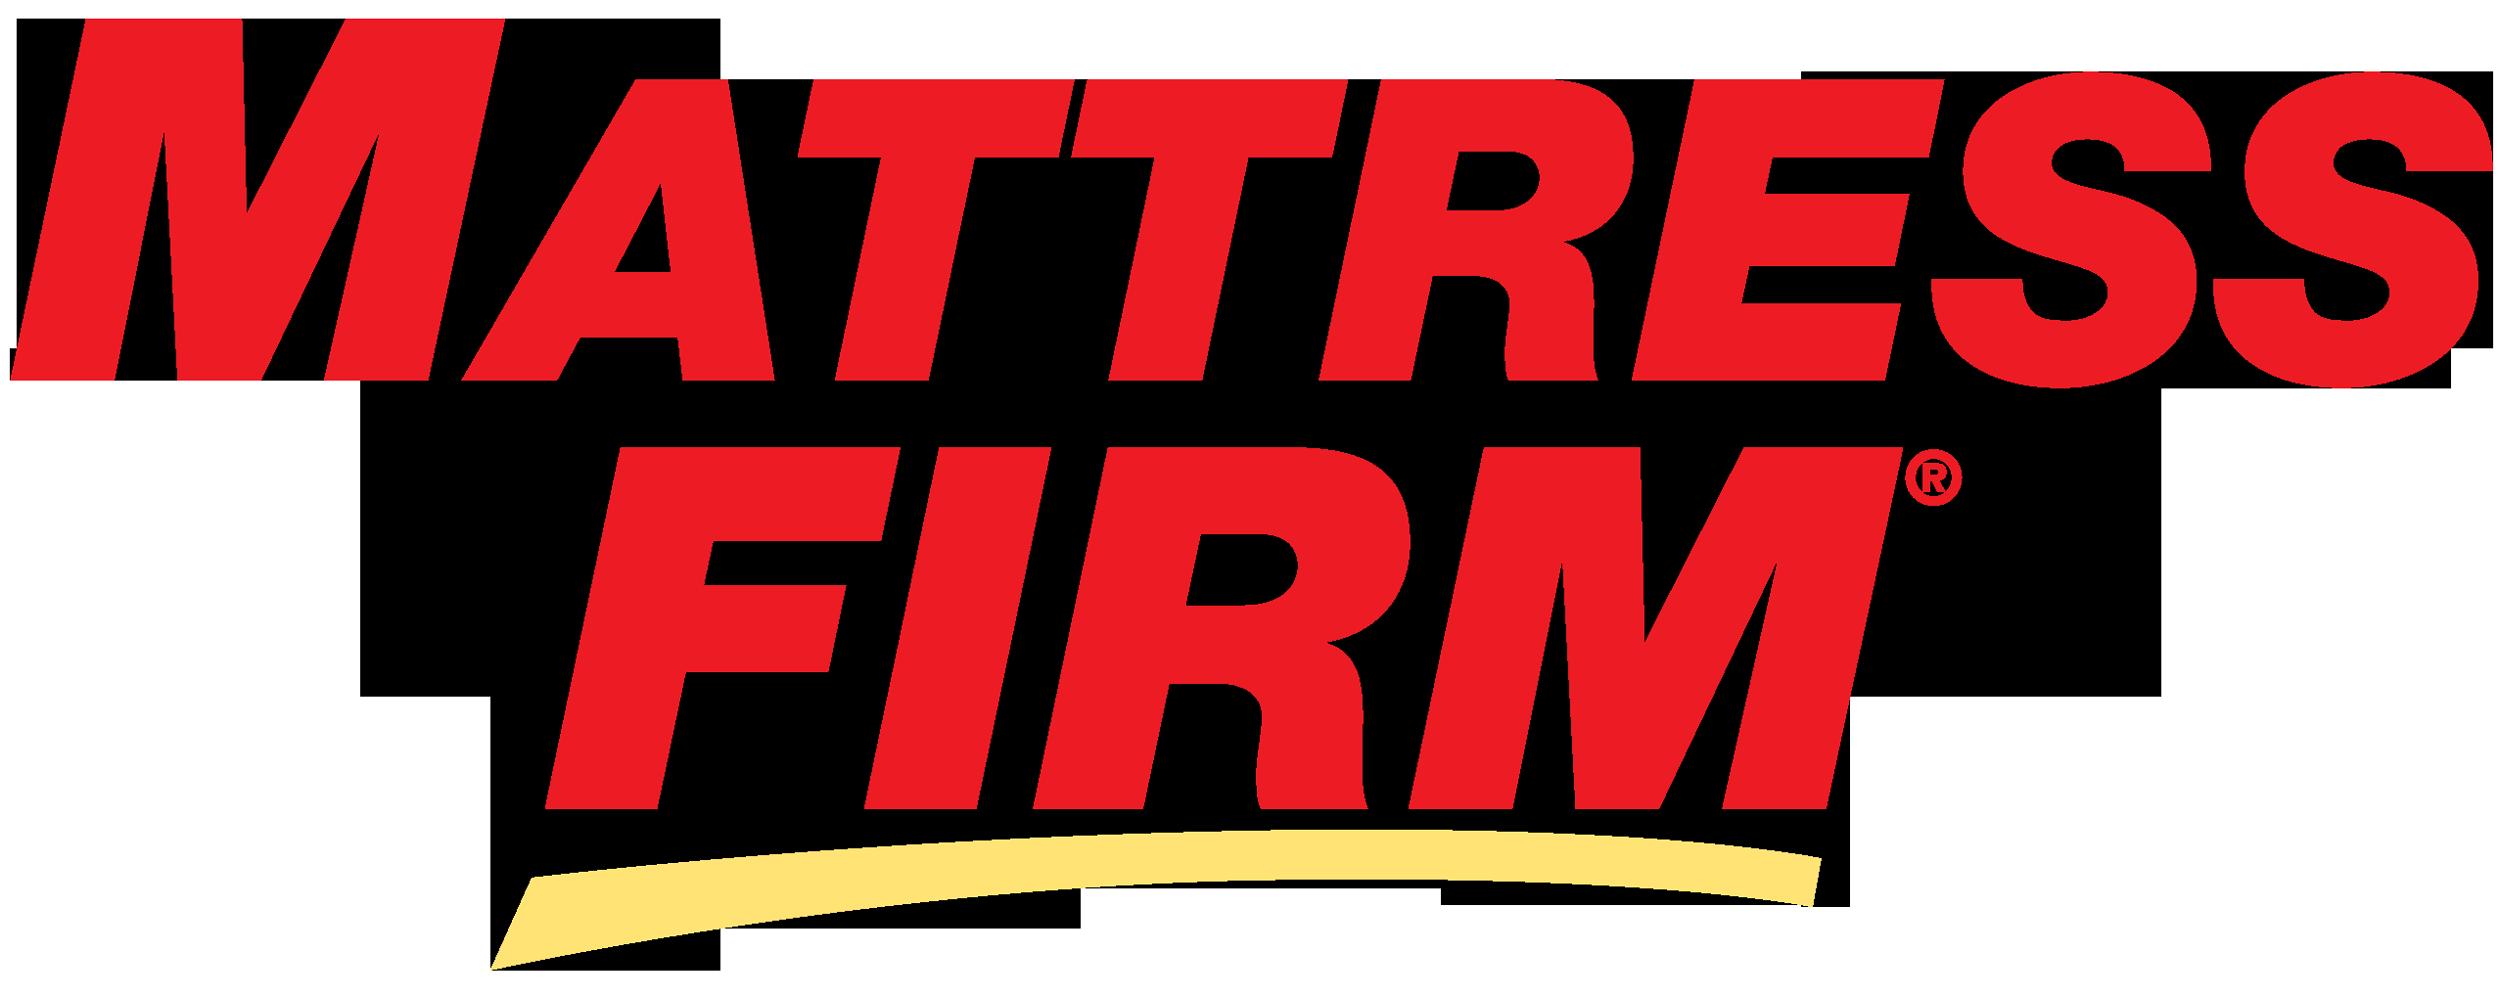 Kitchen And Bath Business Logo